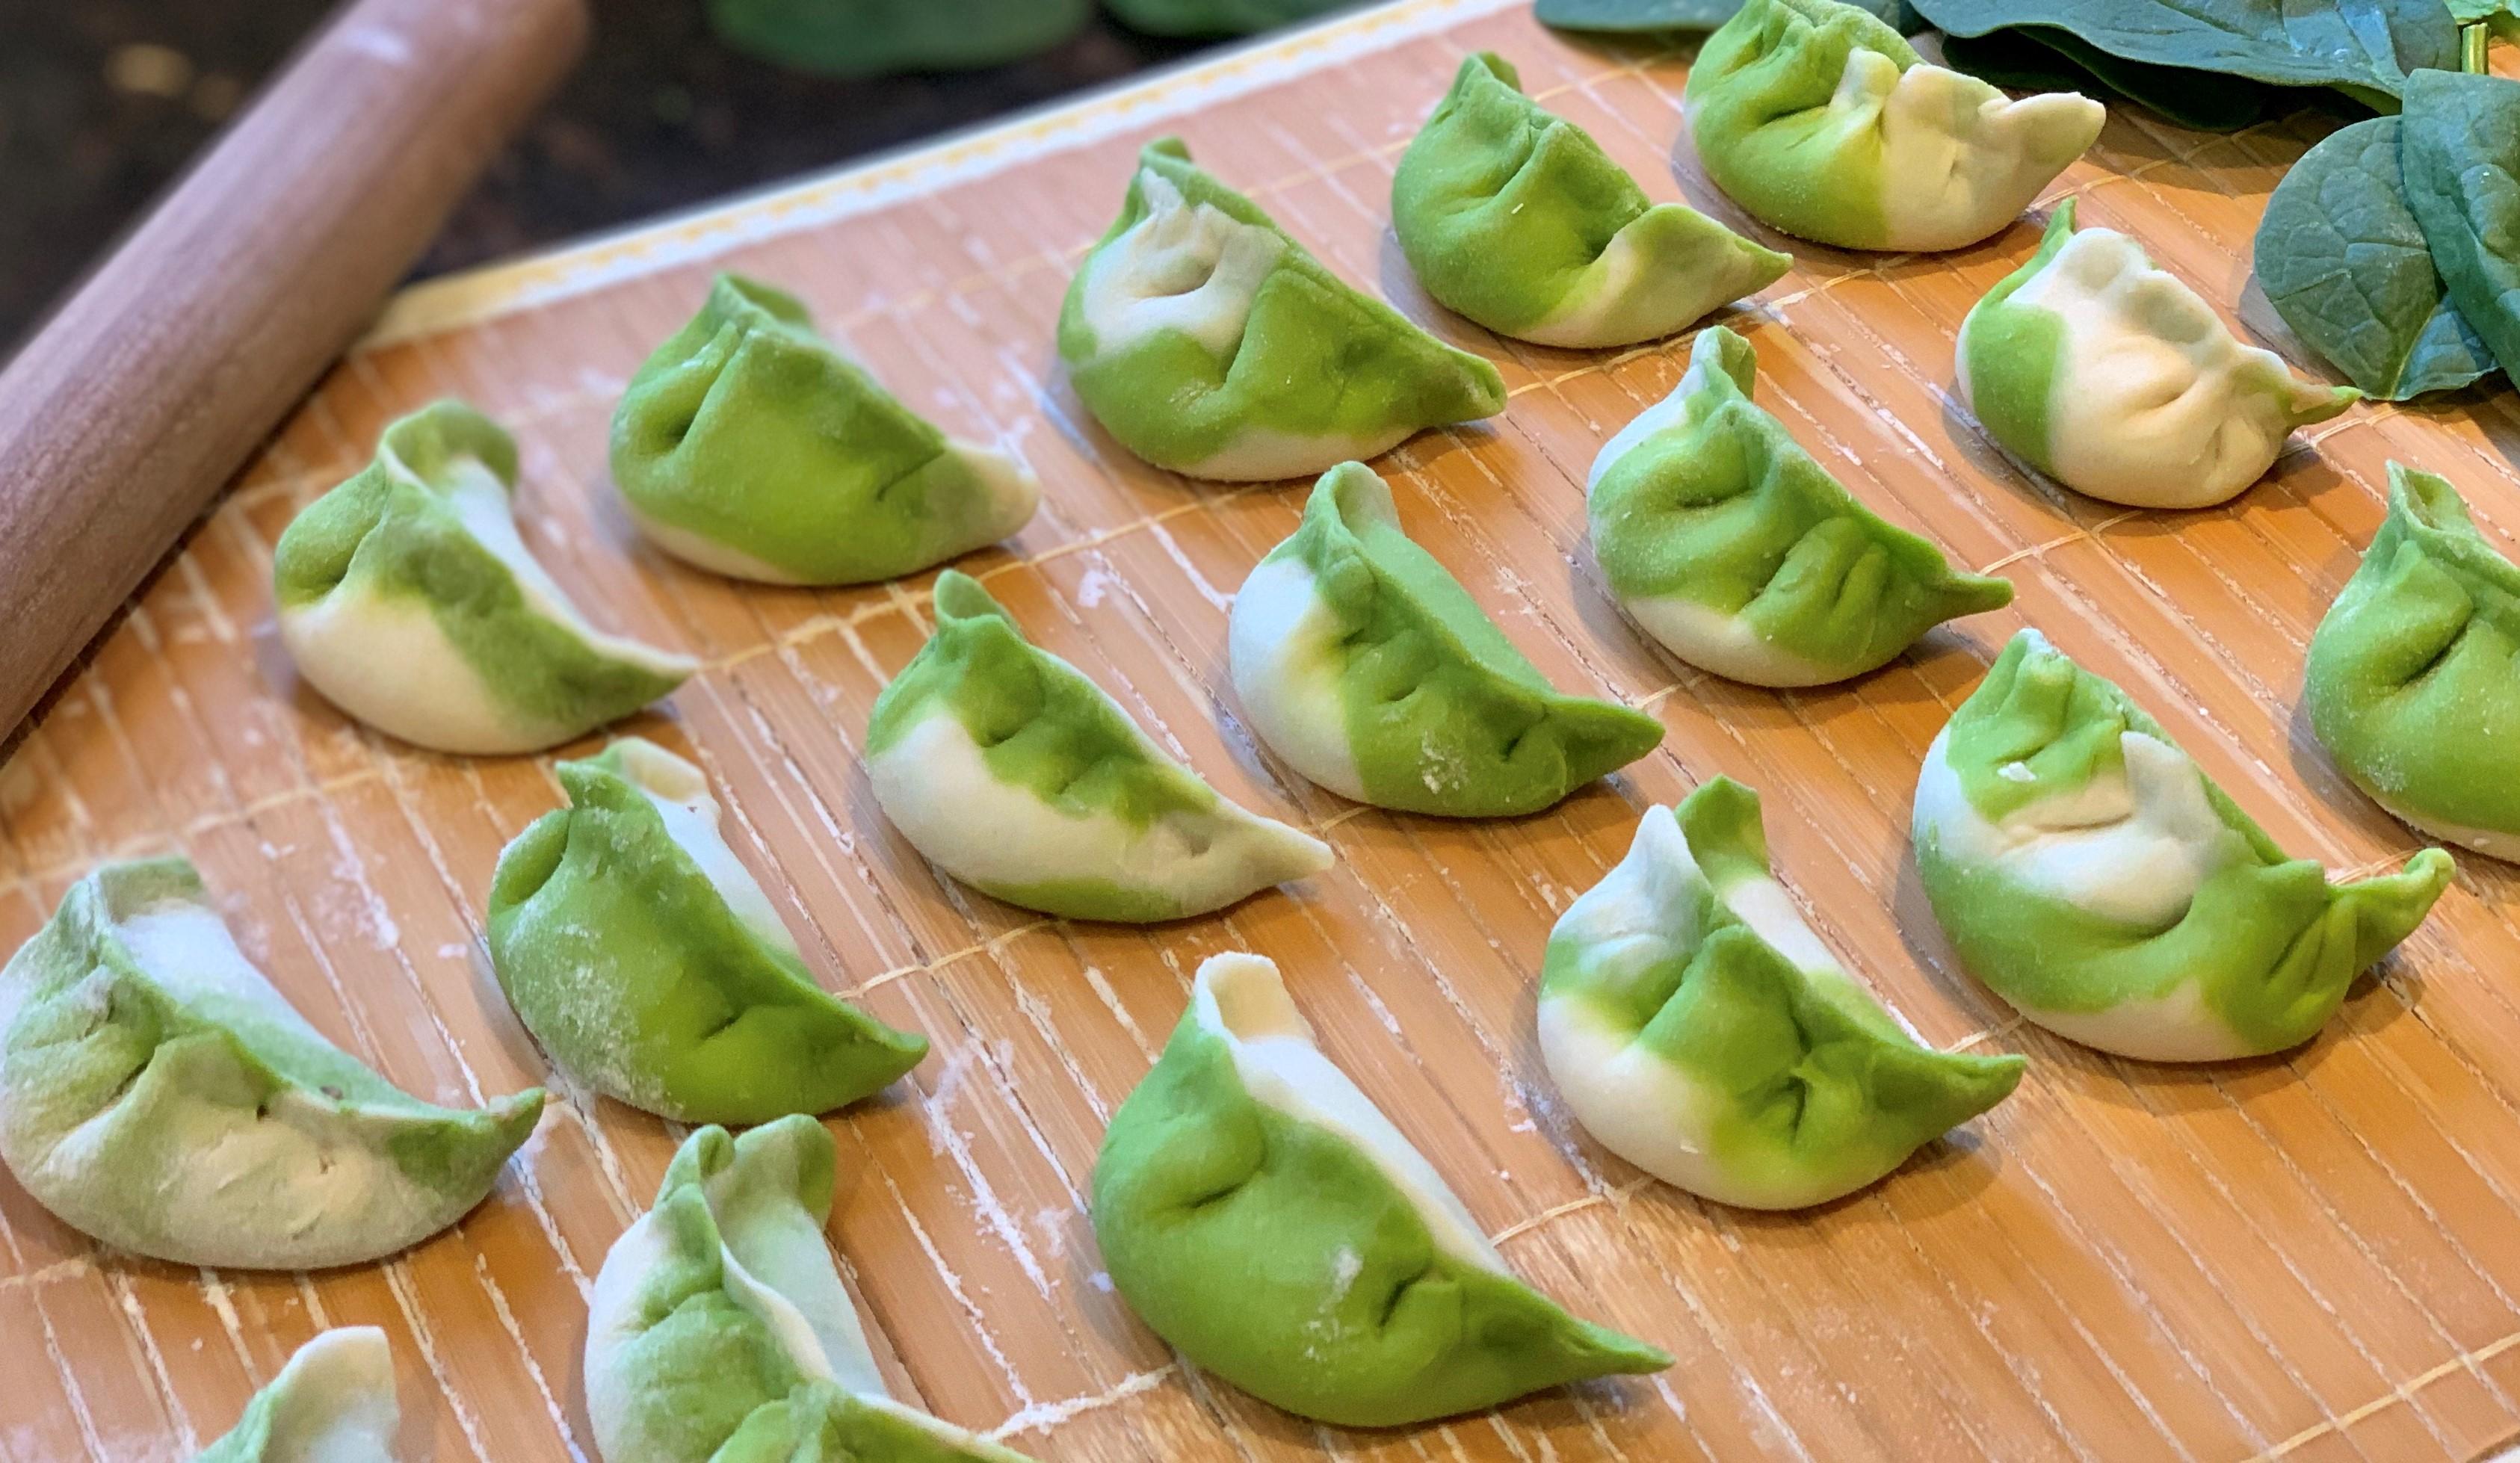 Jade Dumplings 翡翠水饺fěi cuì shuǐ jiǎo